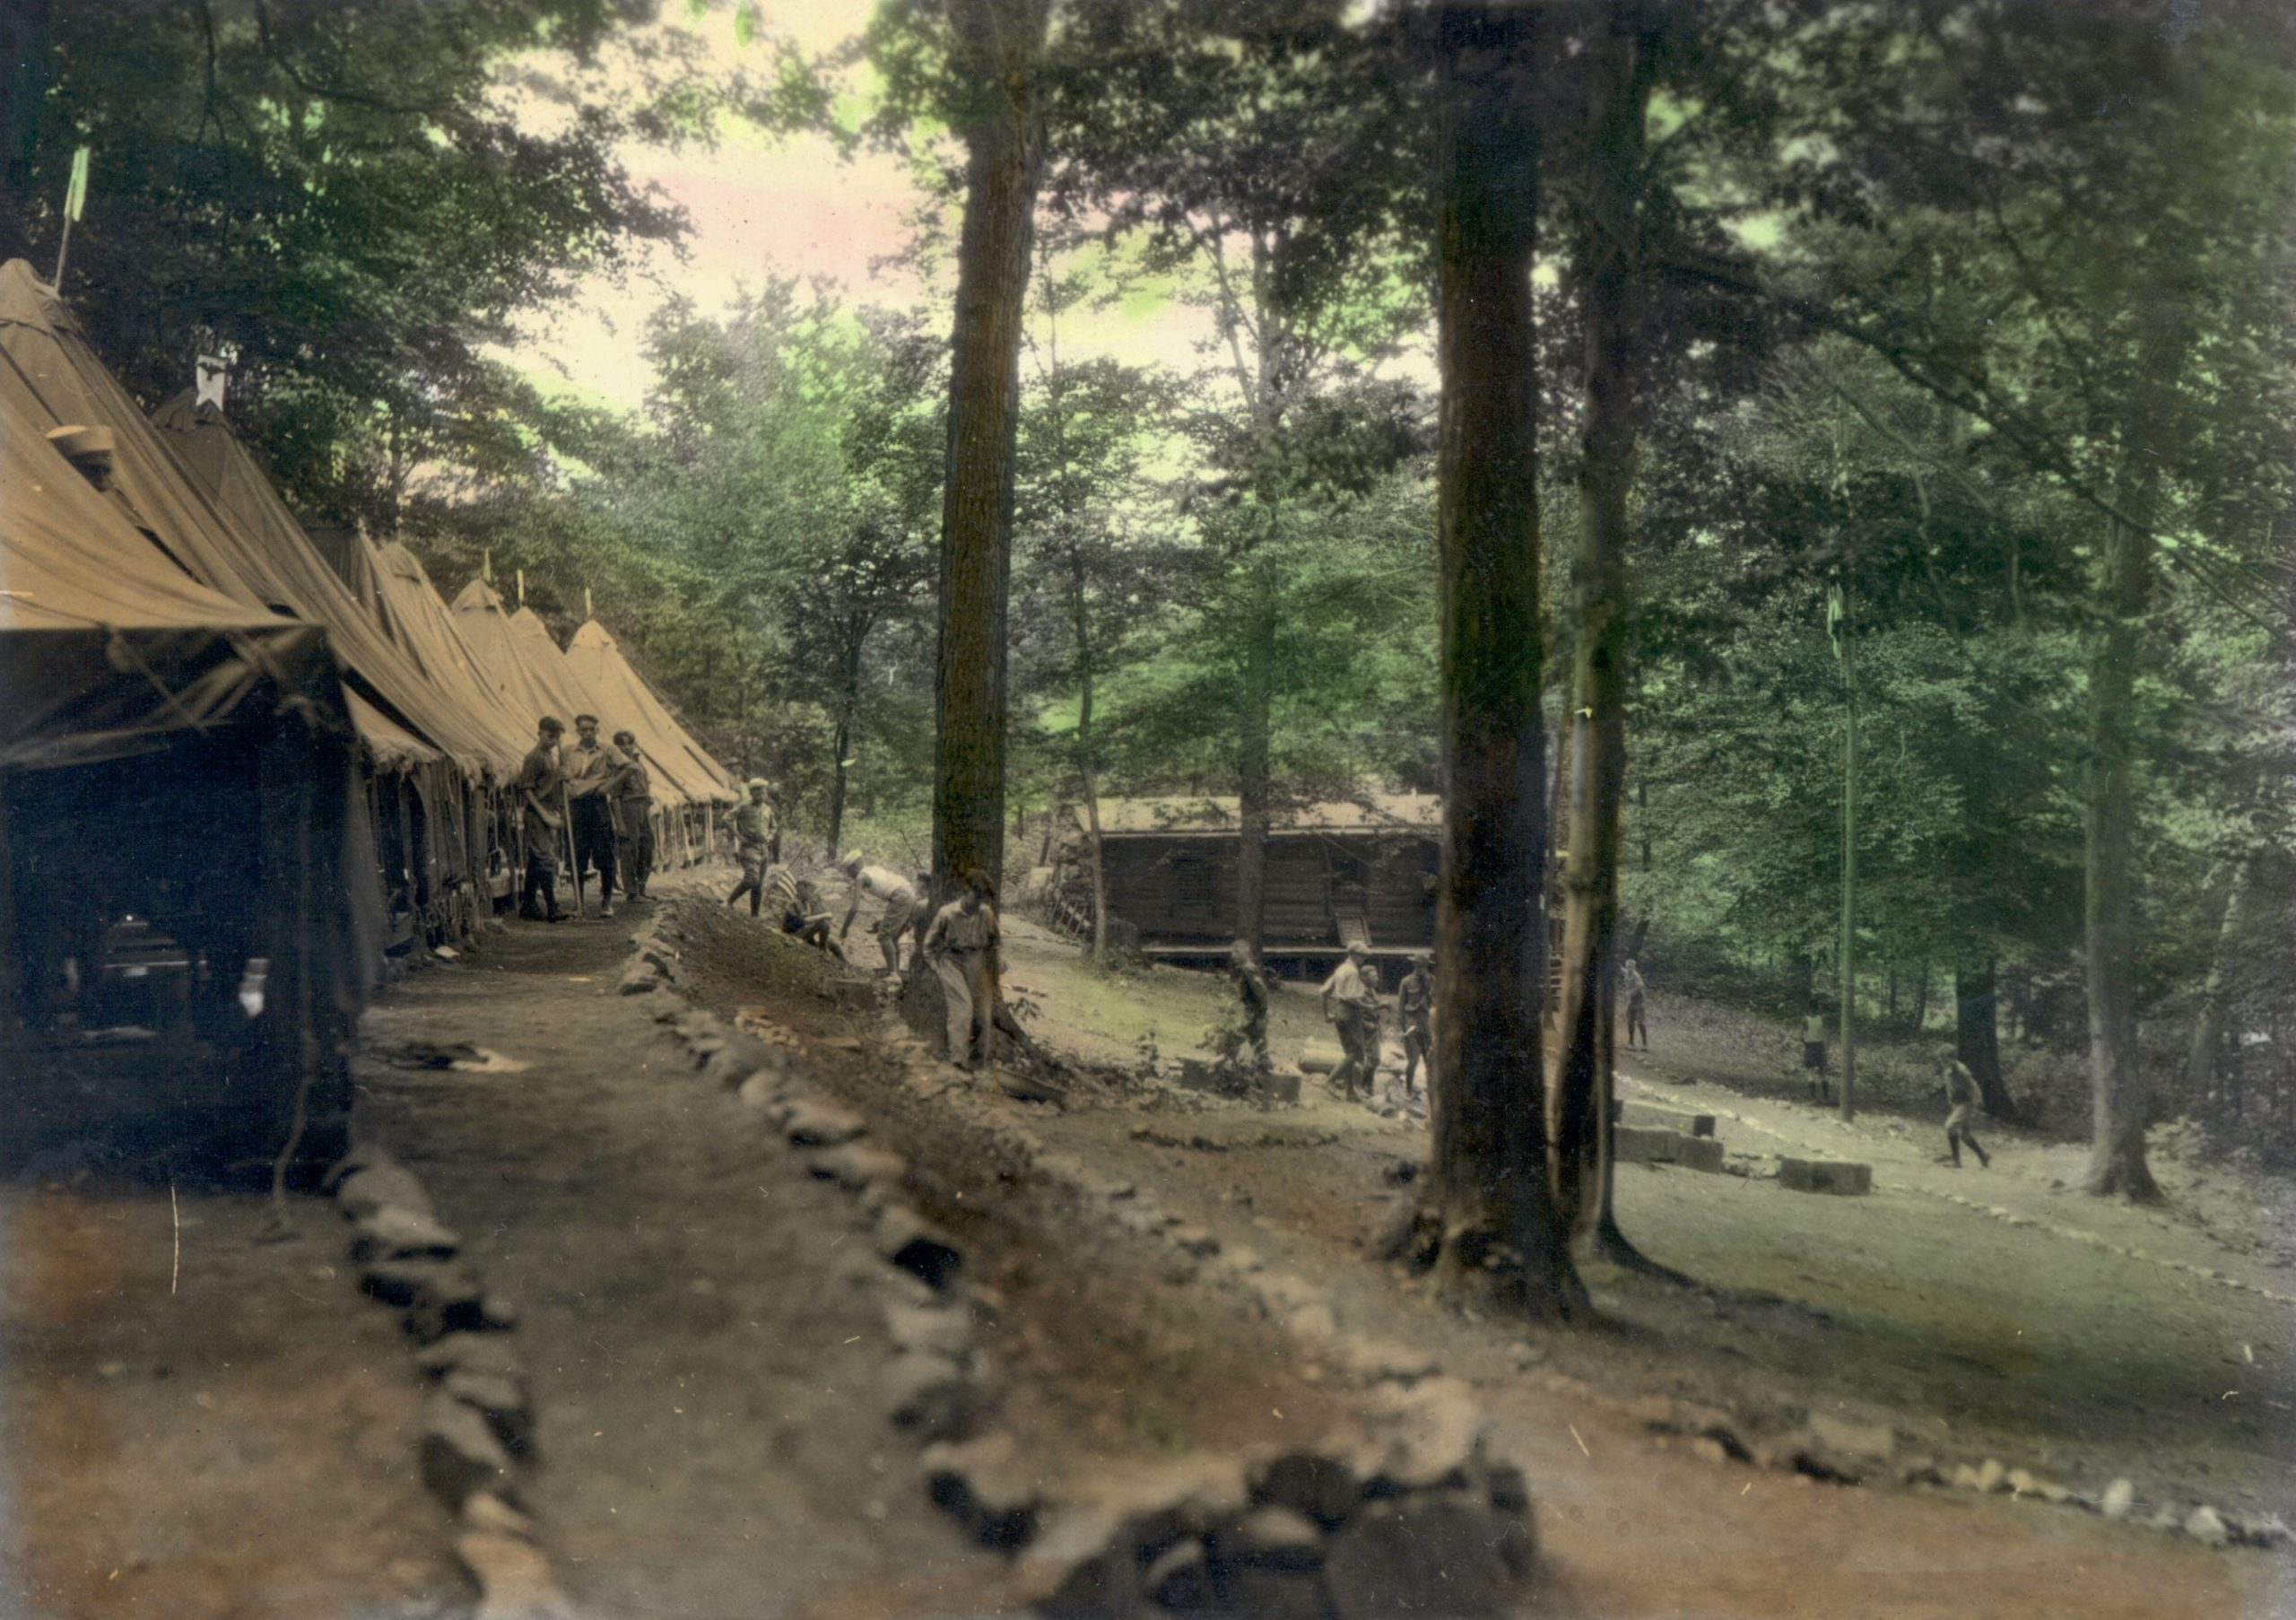 Camp Tuscazoar central camp in 1926